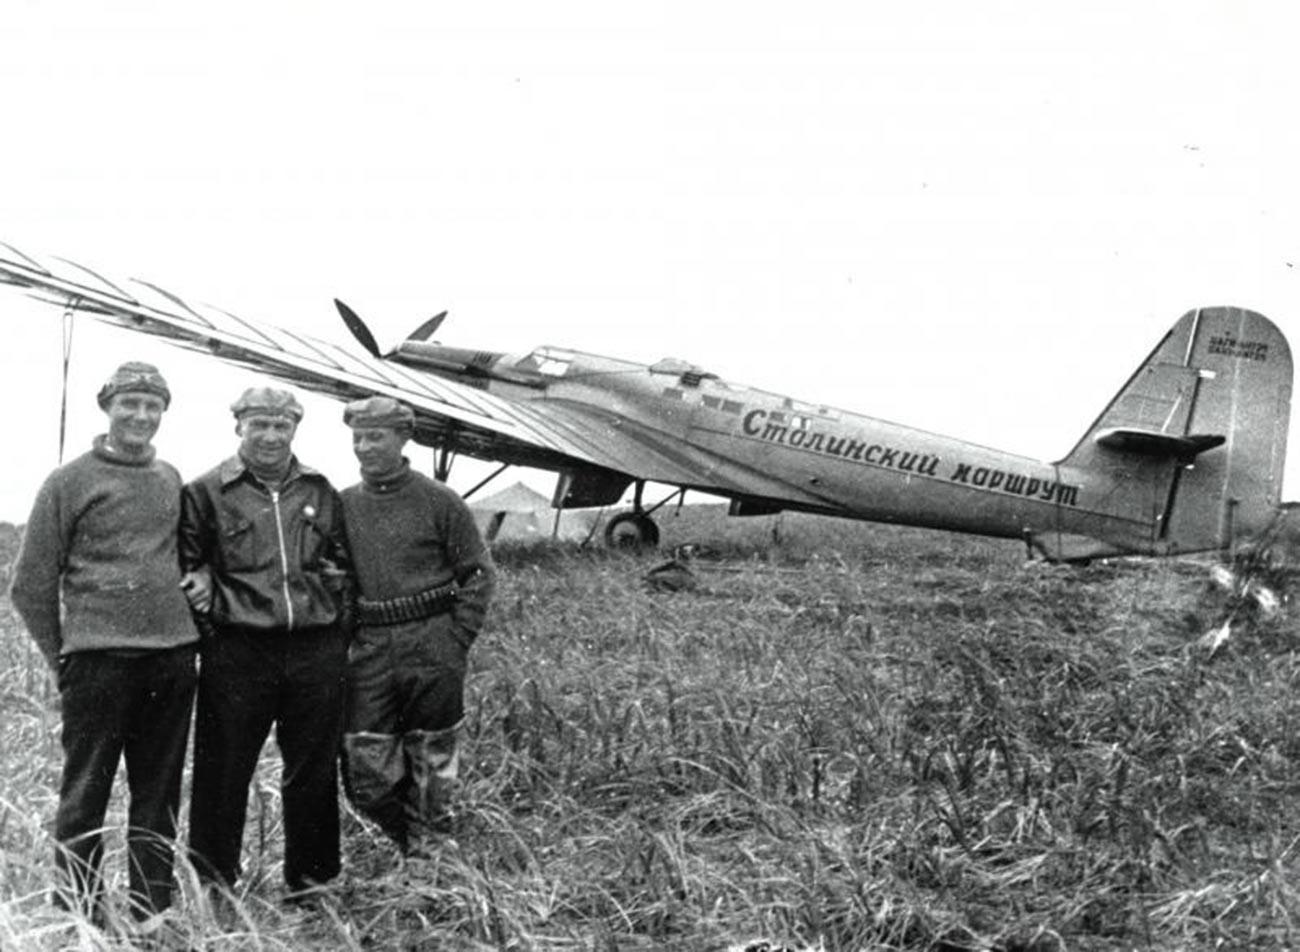 Александър Беляков, Валери Чкалов и Георги Байдуков на остров Уд